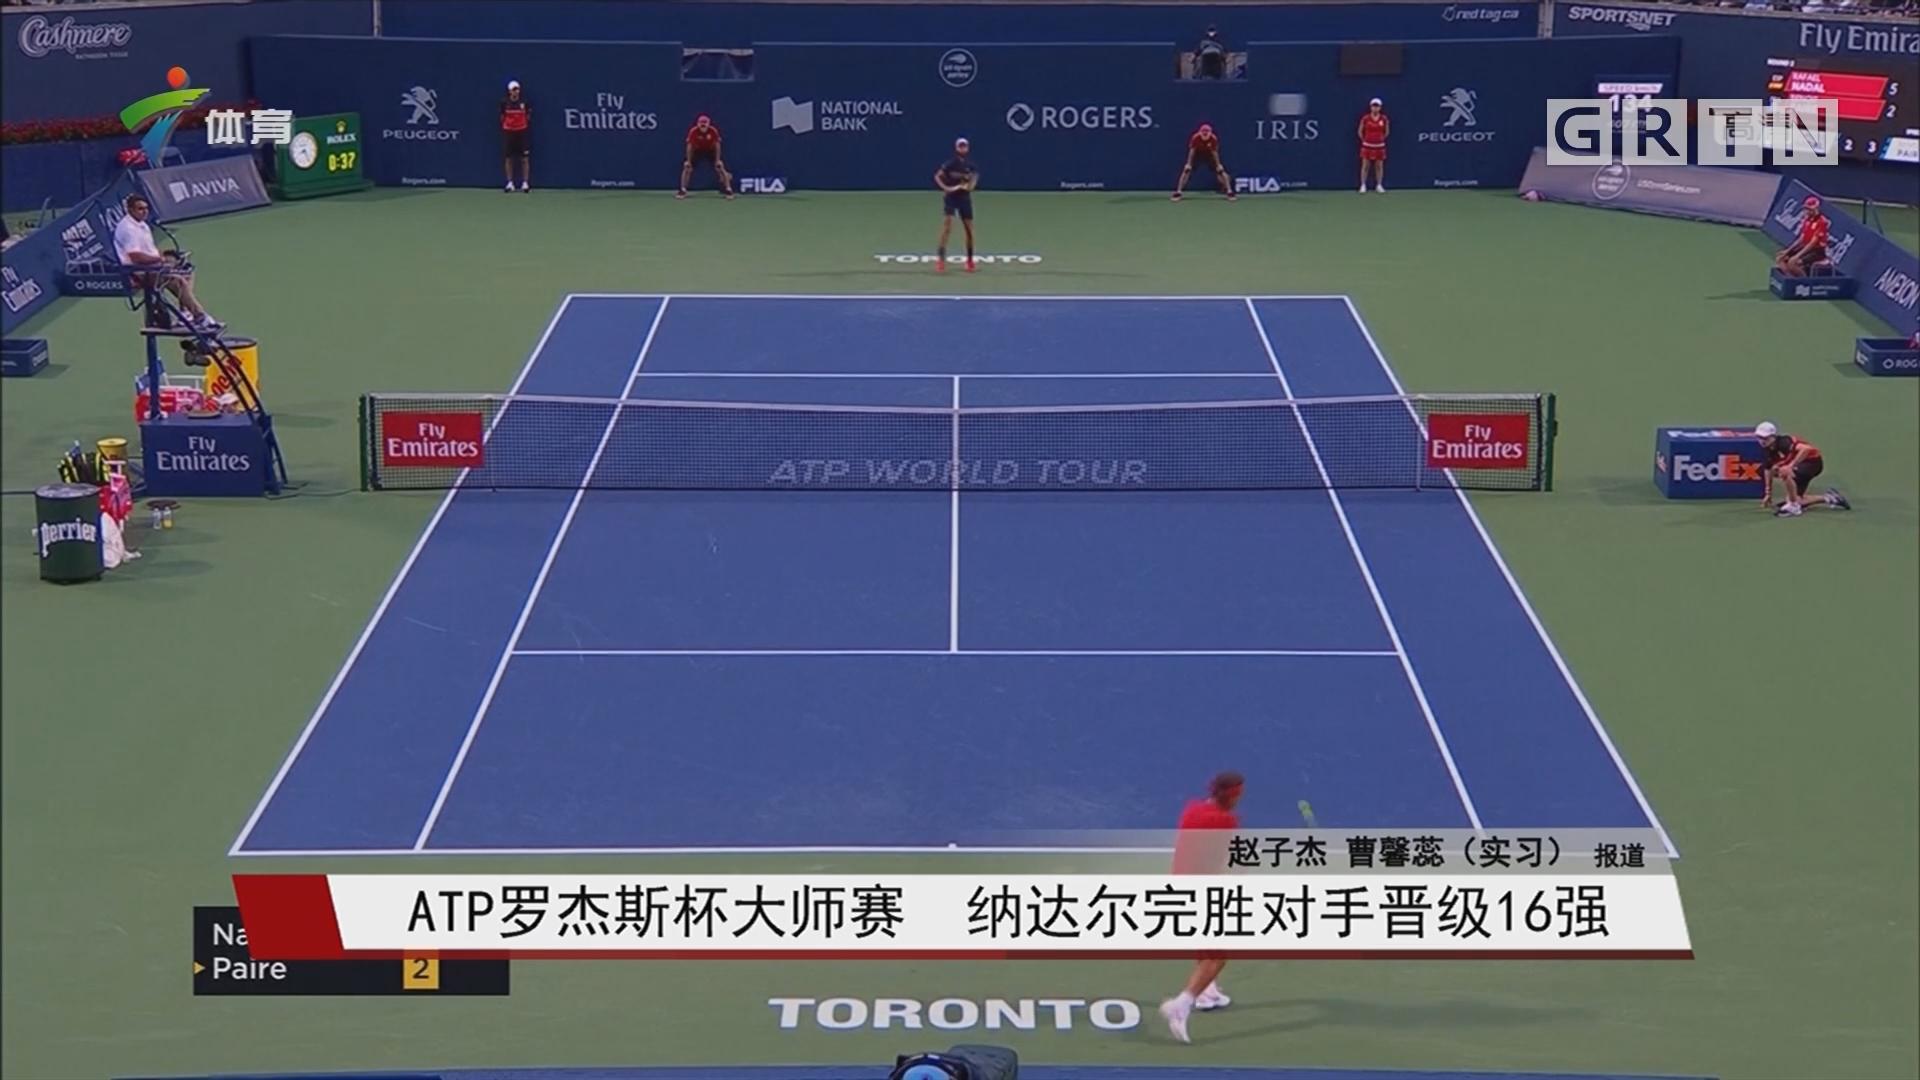 ATP罗杰斯杯大师赛 纳达尔完胜对手晋级16强